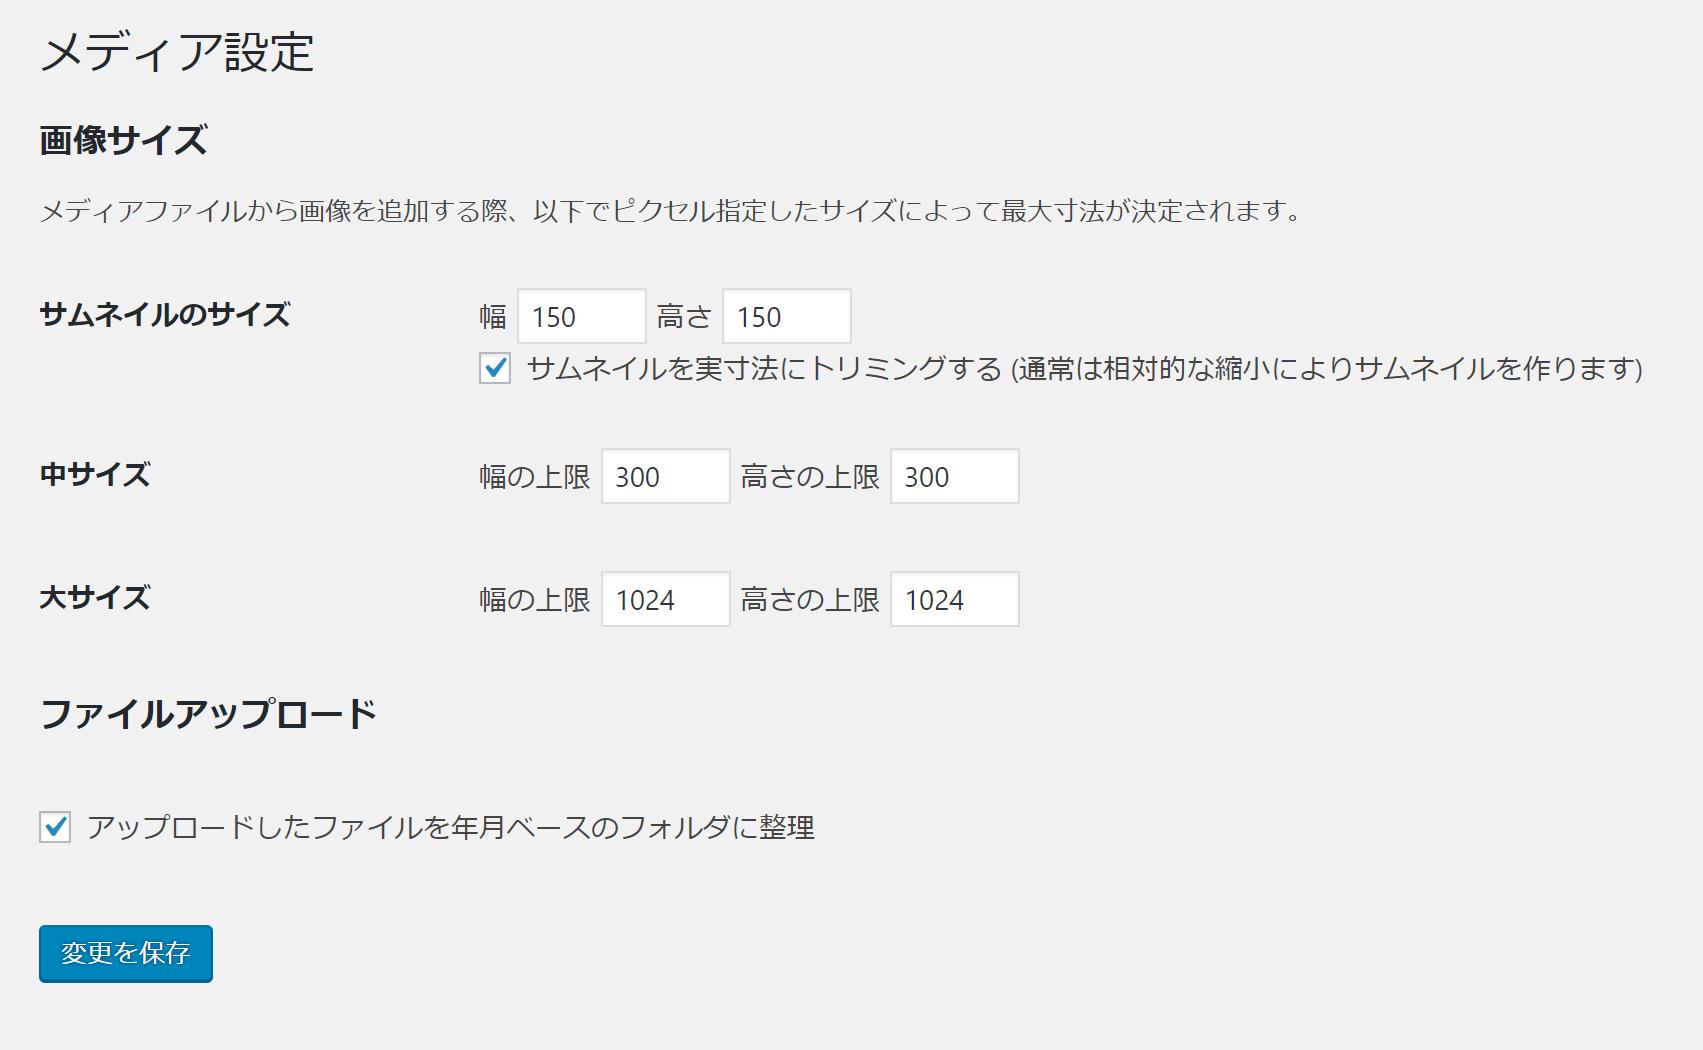 media settings - WordPressのアイキャッチ画像を自動設定!プラグインで表示されない時の対処法